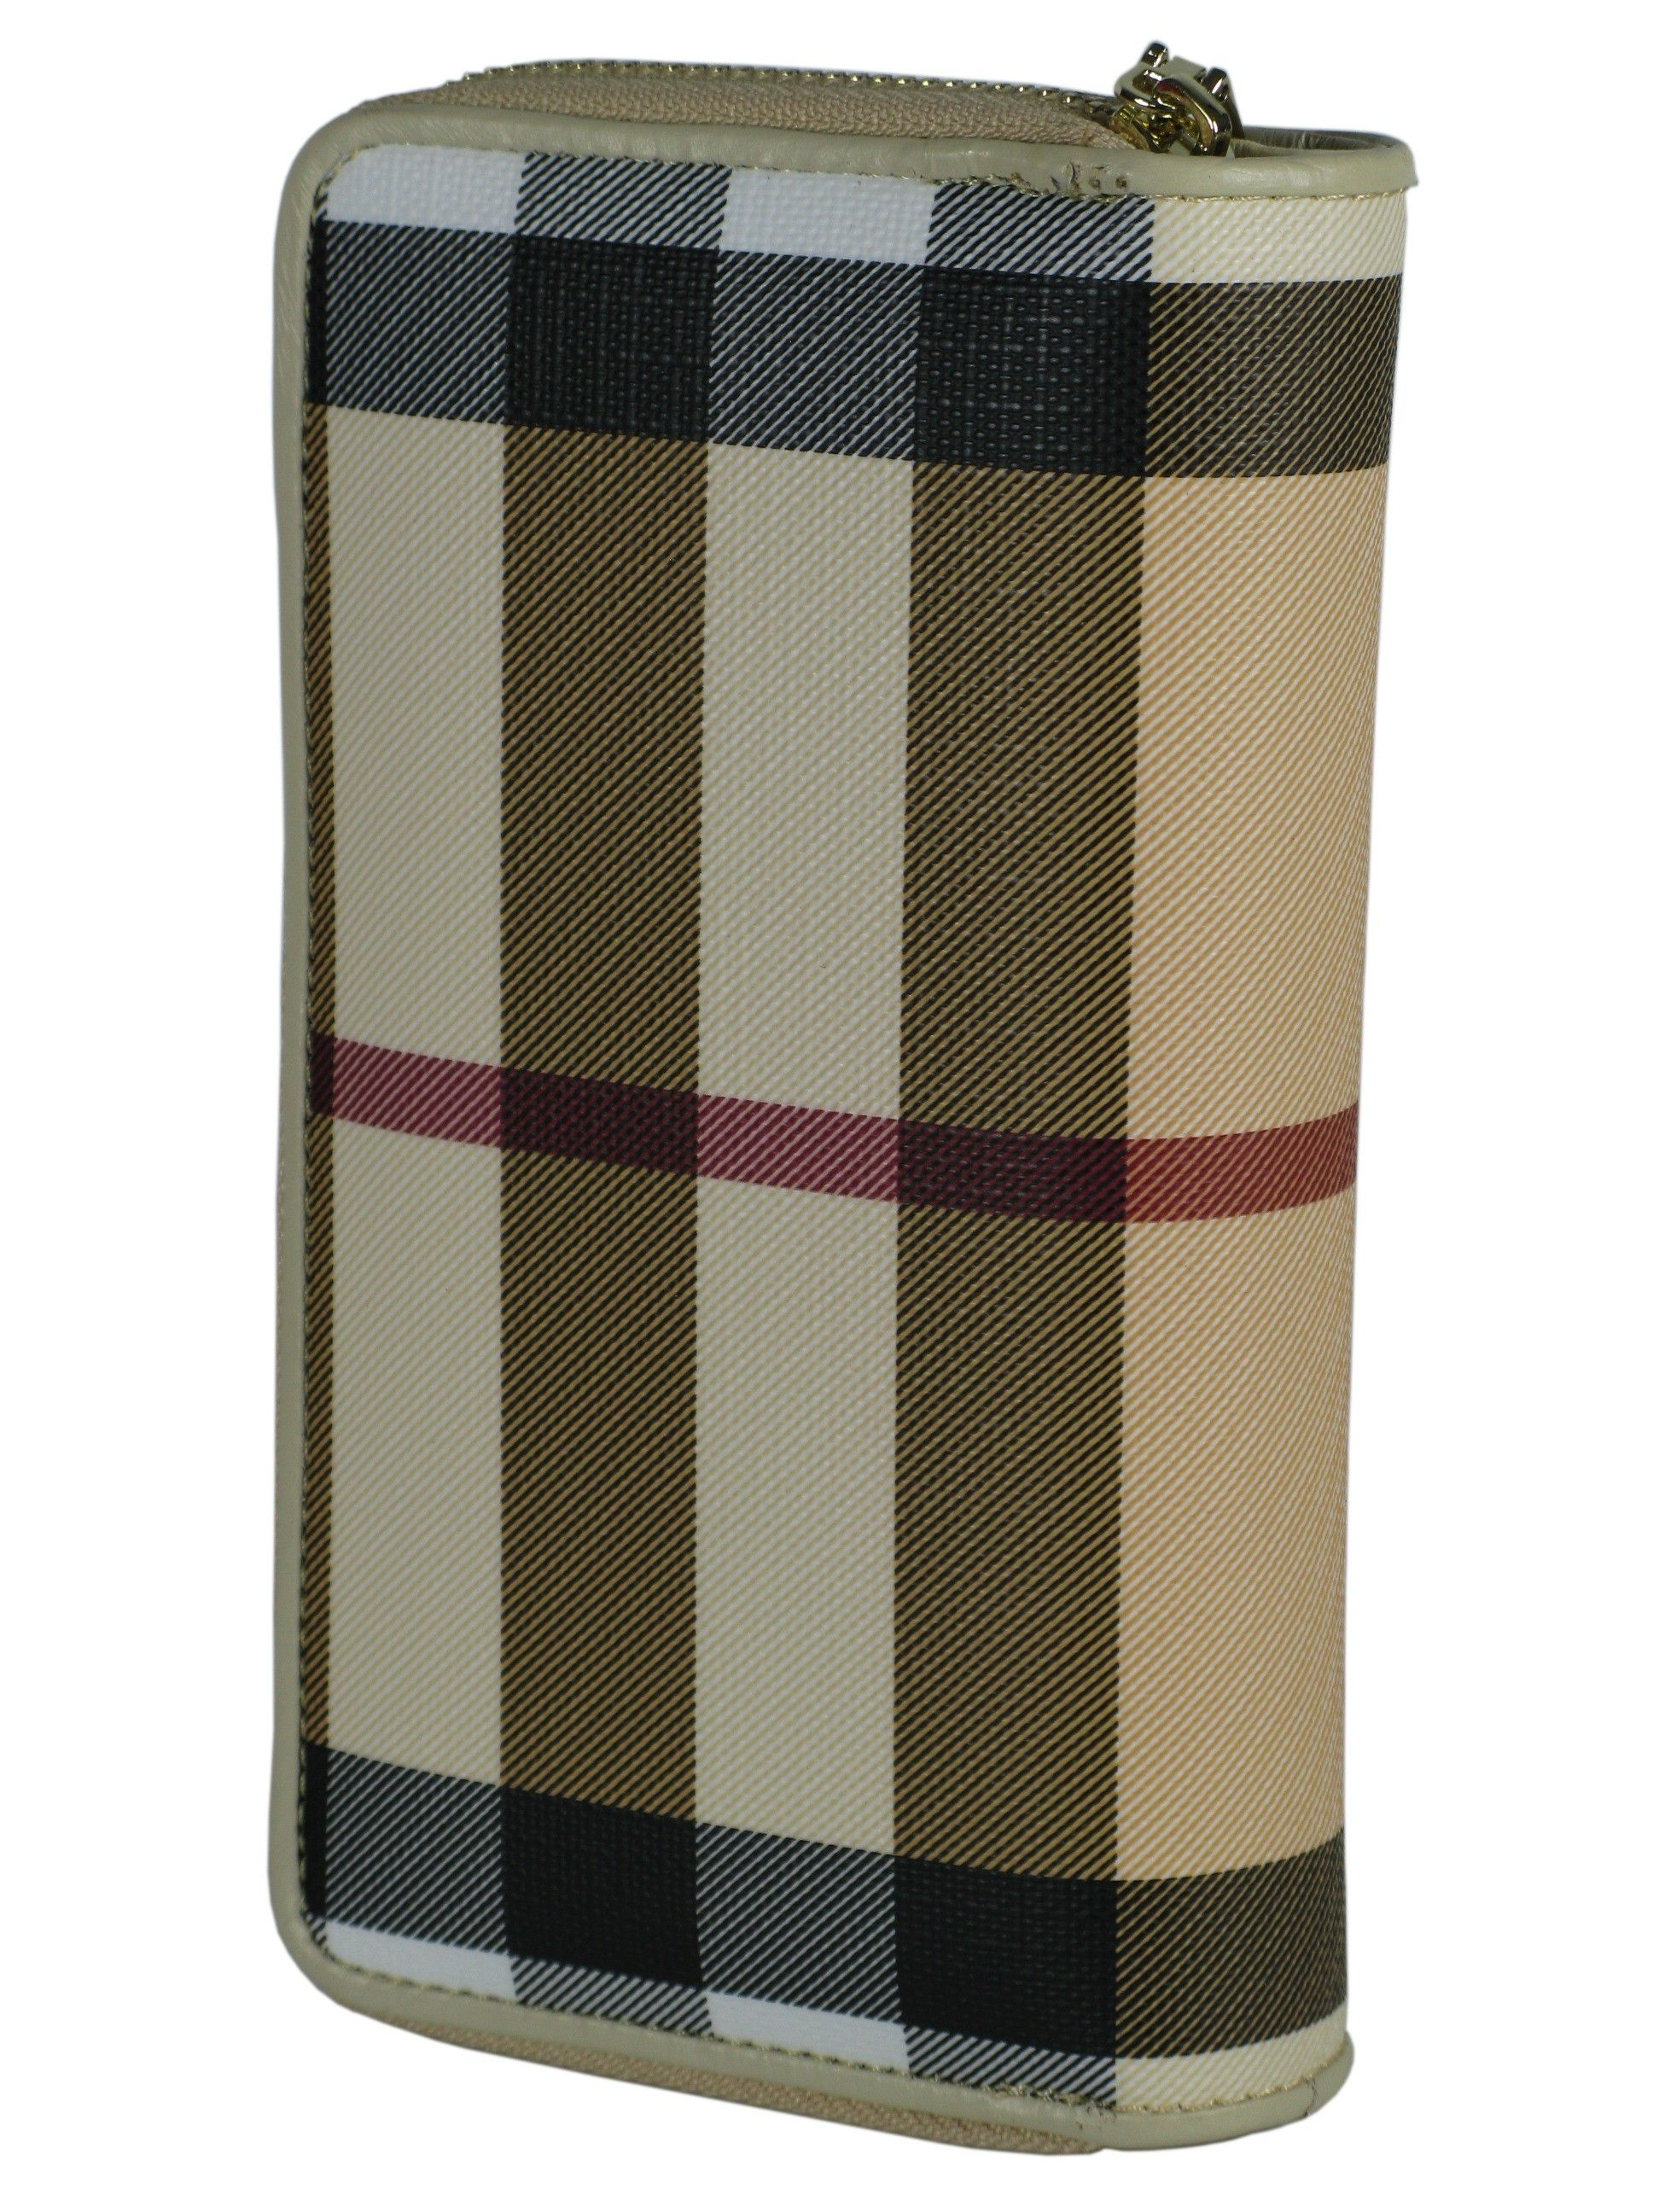 ecf9eab5b4858 portfel damski skórzany allegro czerwony peterson lakierowany portfel  damski skórzany allegro czarny peterson lakierowany ...